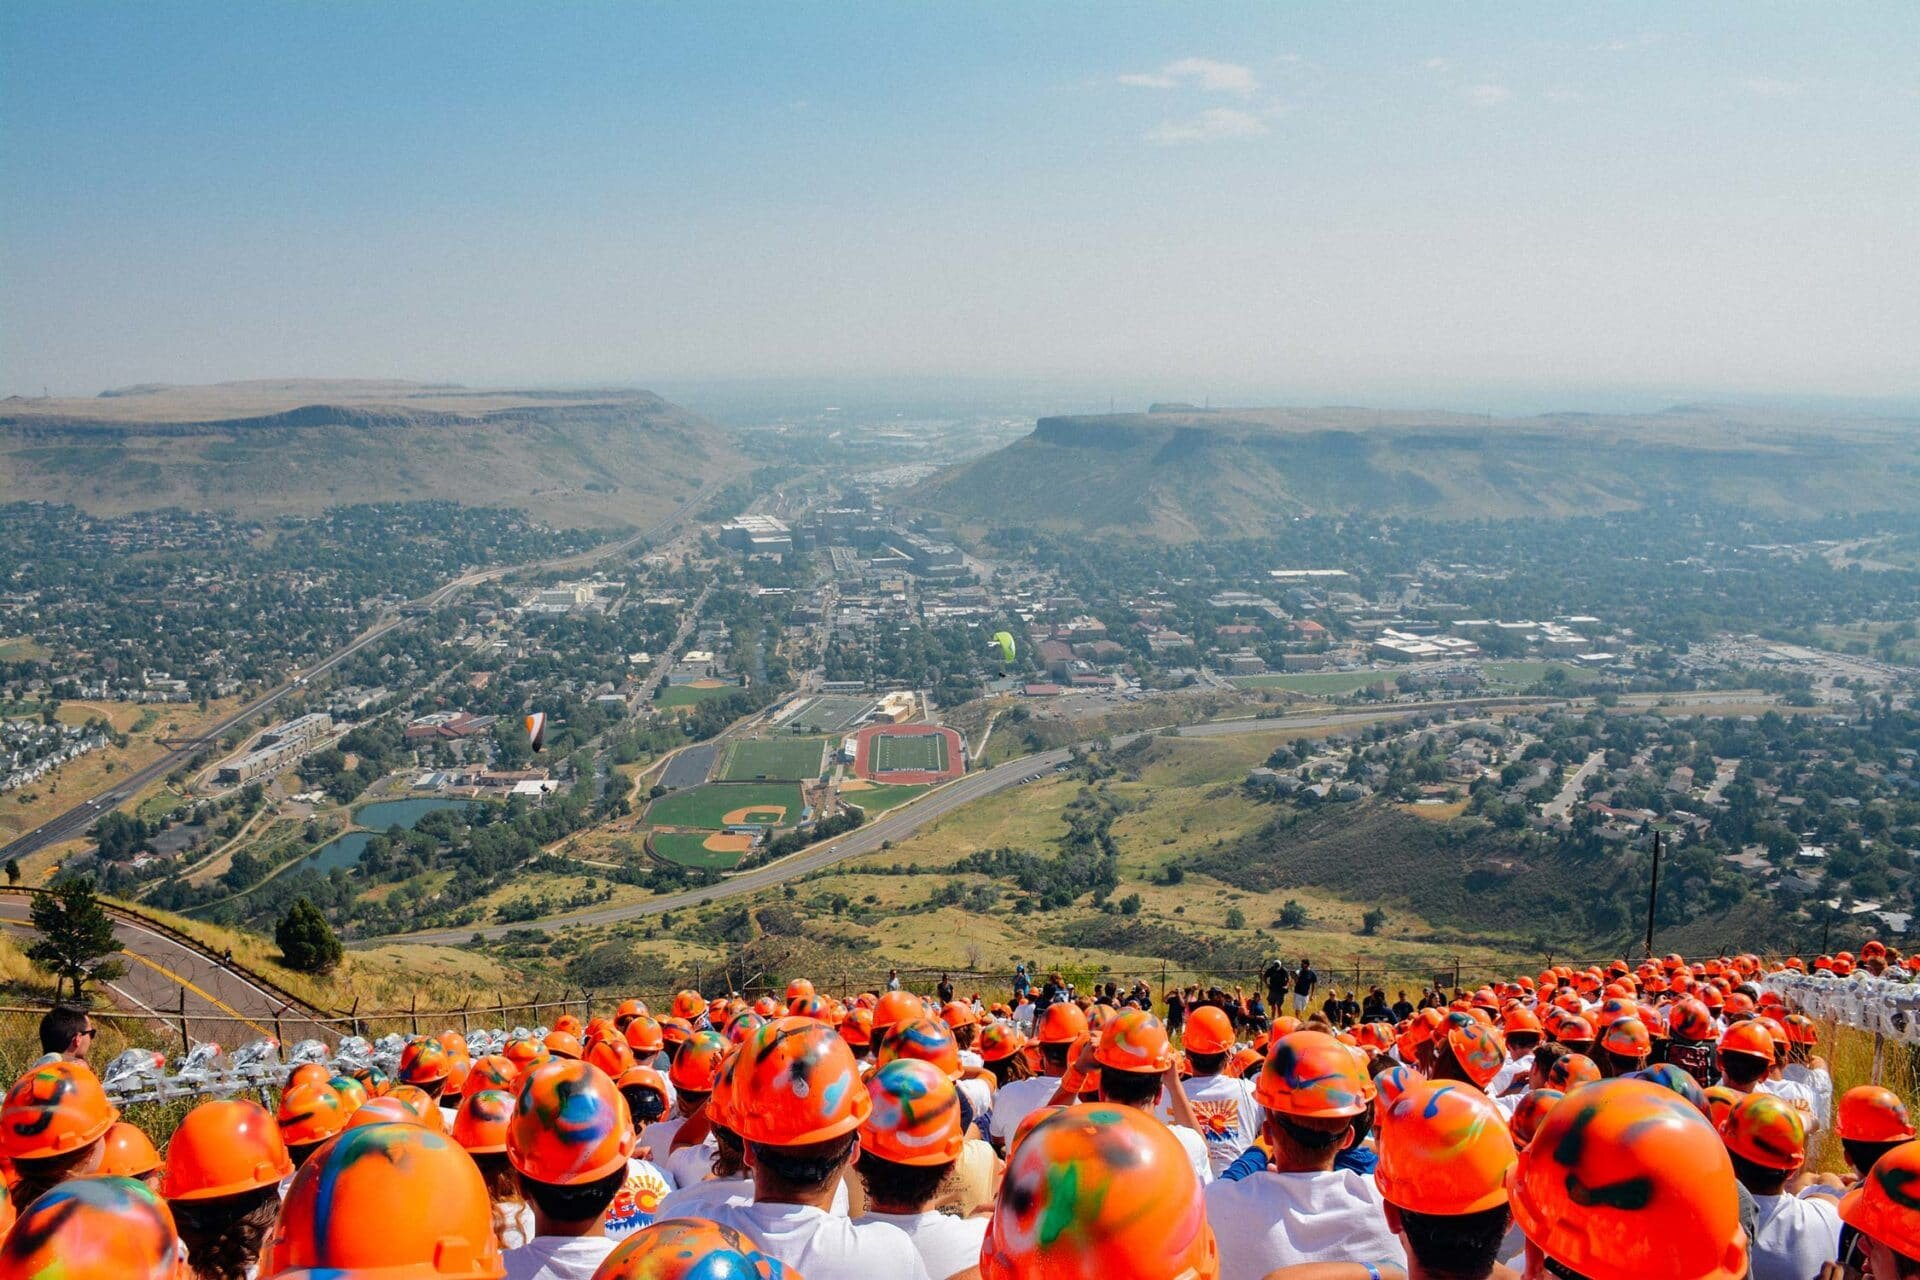 FODS_SchoolOfMines_Students-M-Climb-looking-at-Mines.jpg